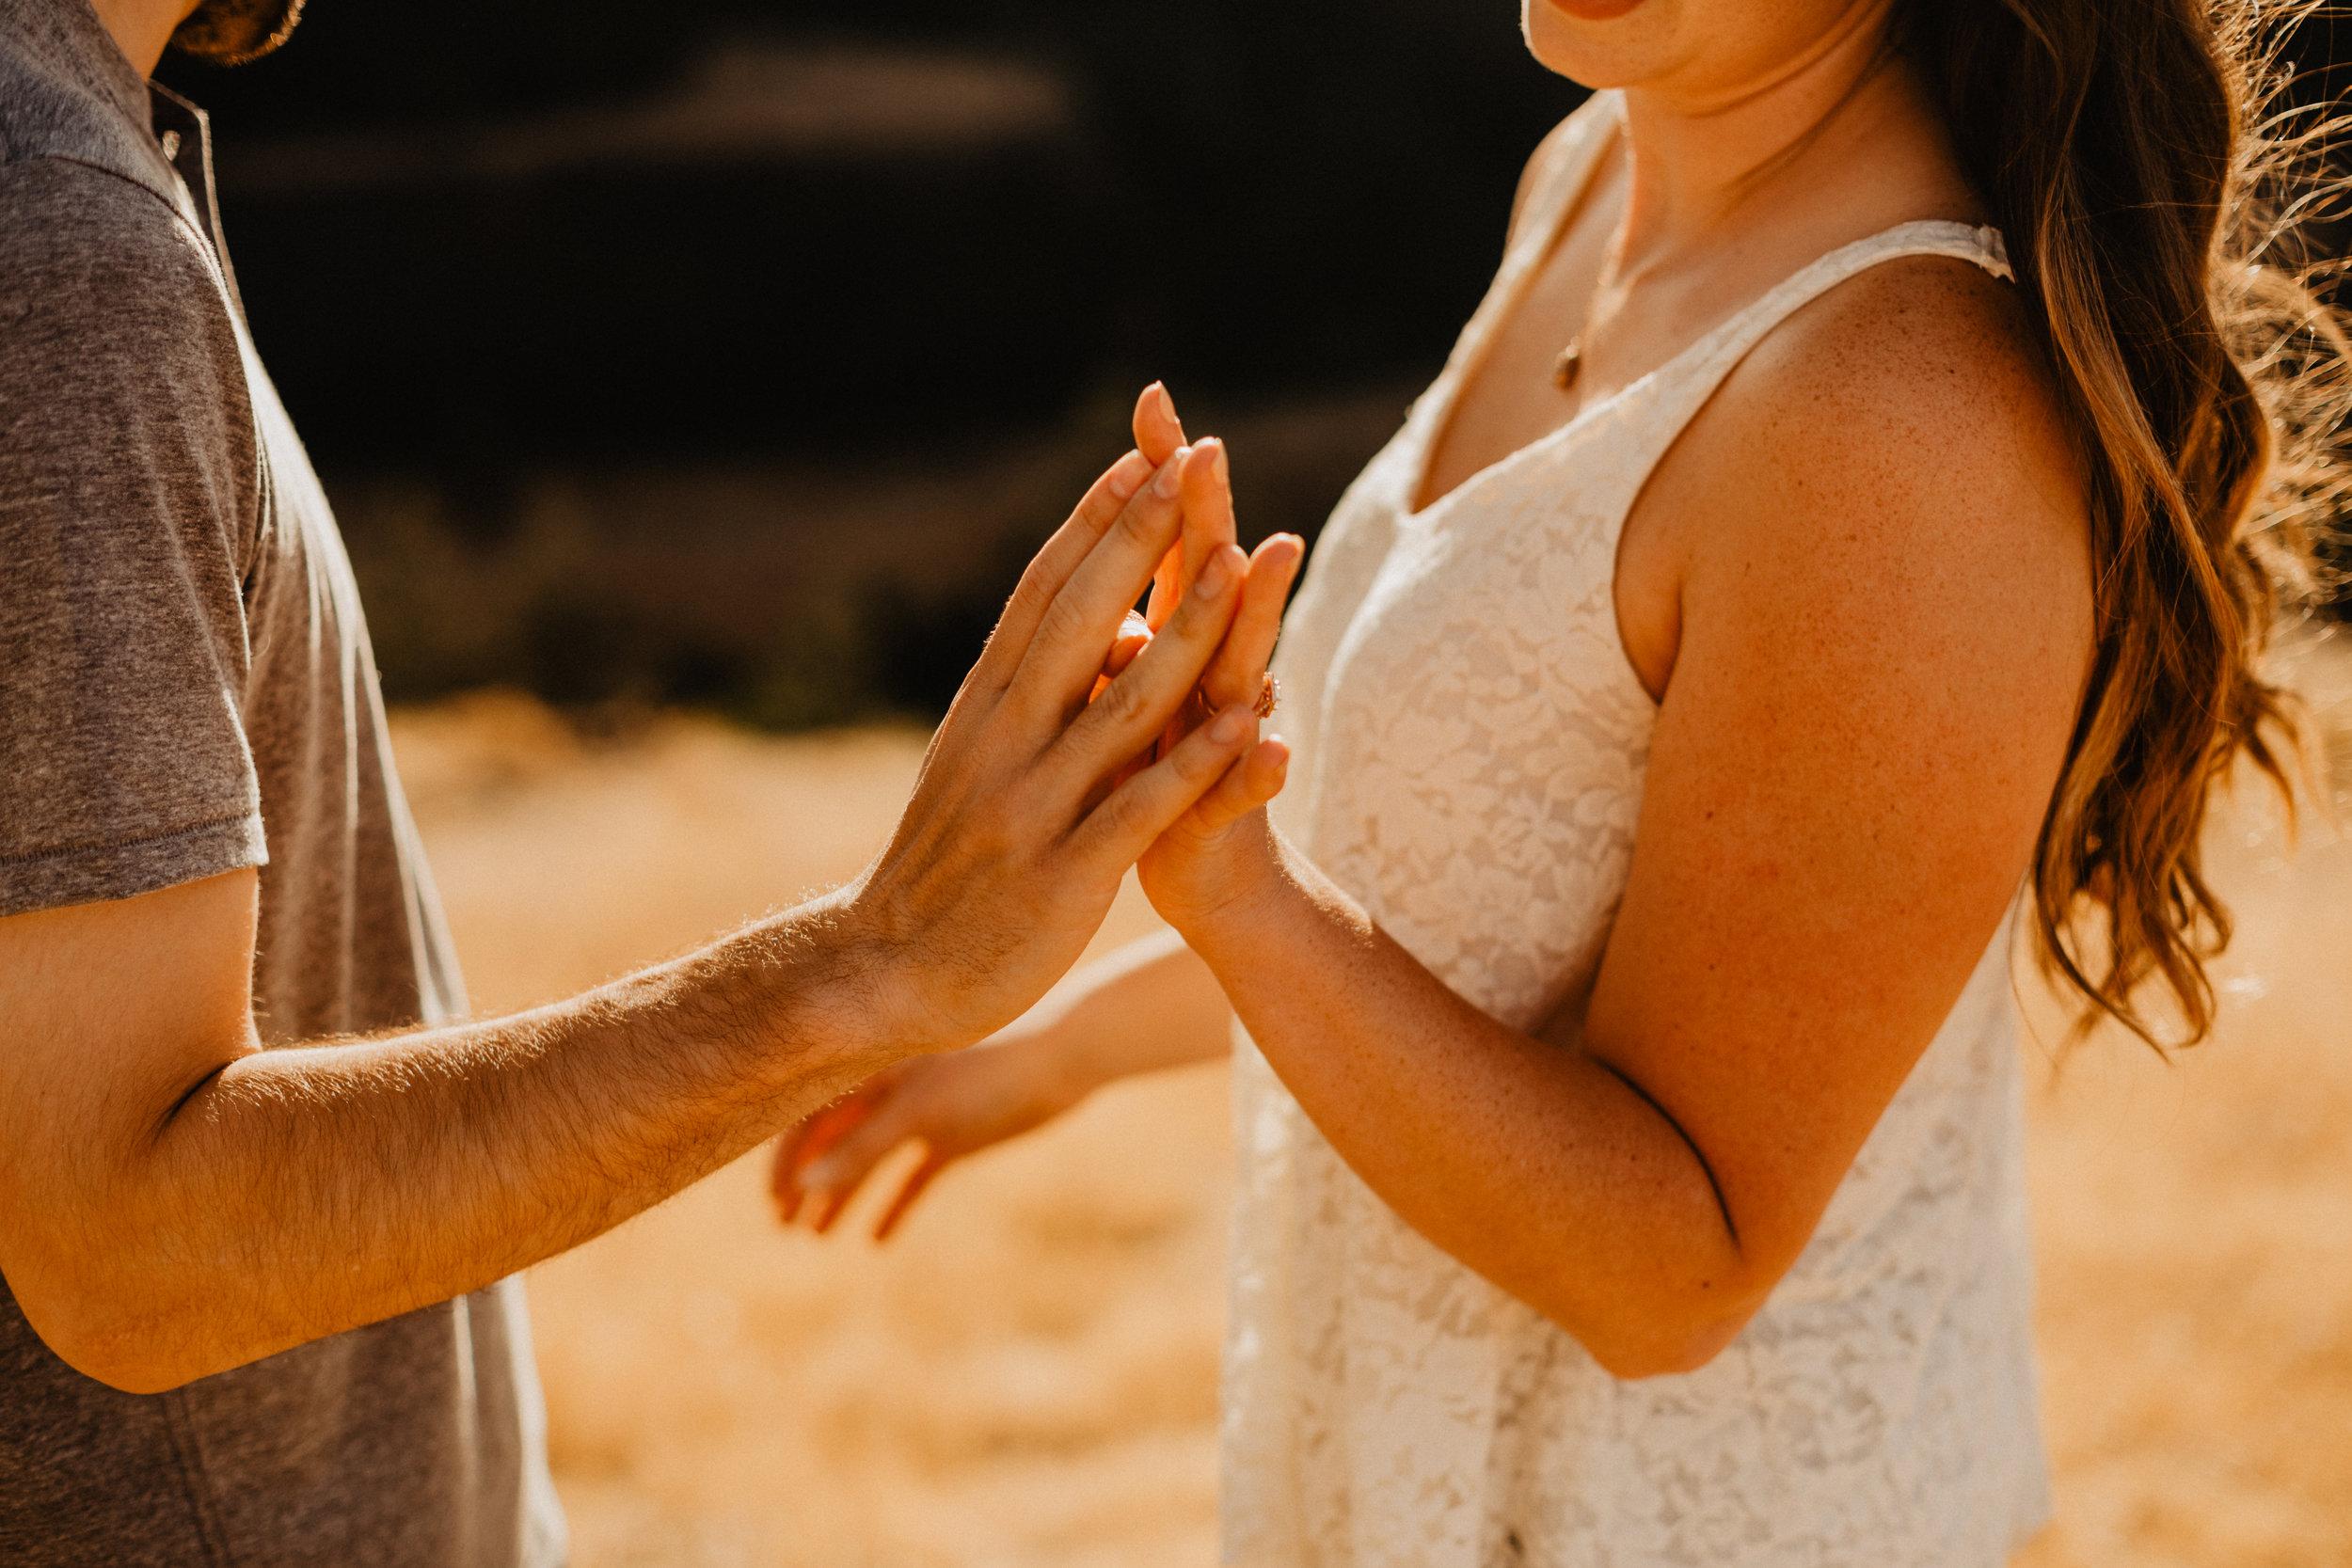 rowena crest engagement, oregon wedding photographer, engagement photos, natural light photographer-6.jpg